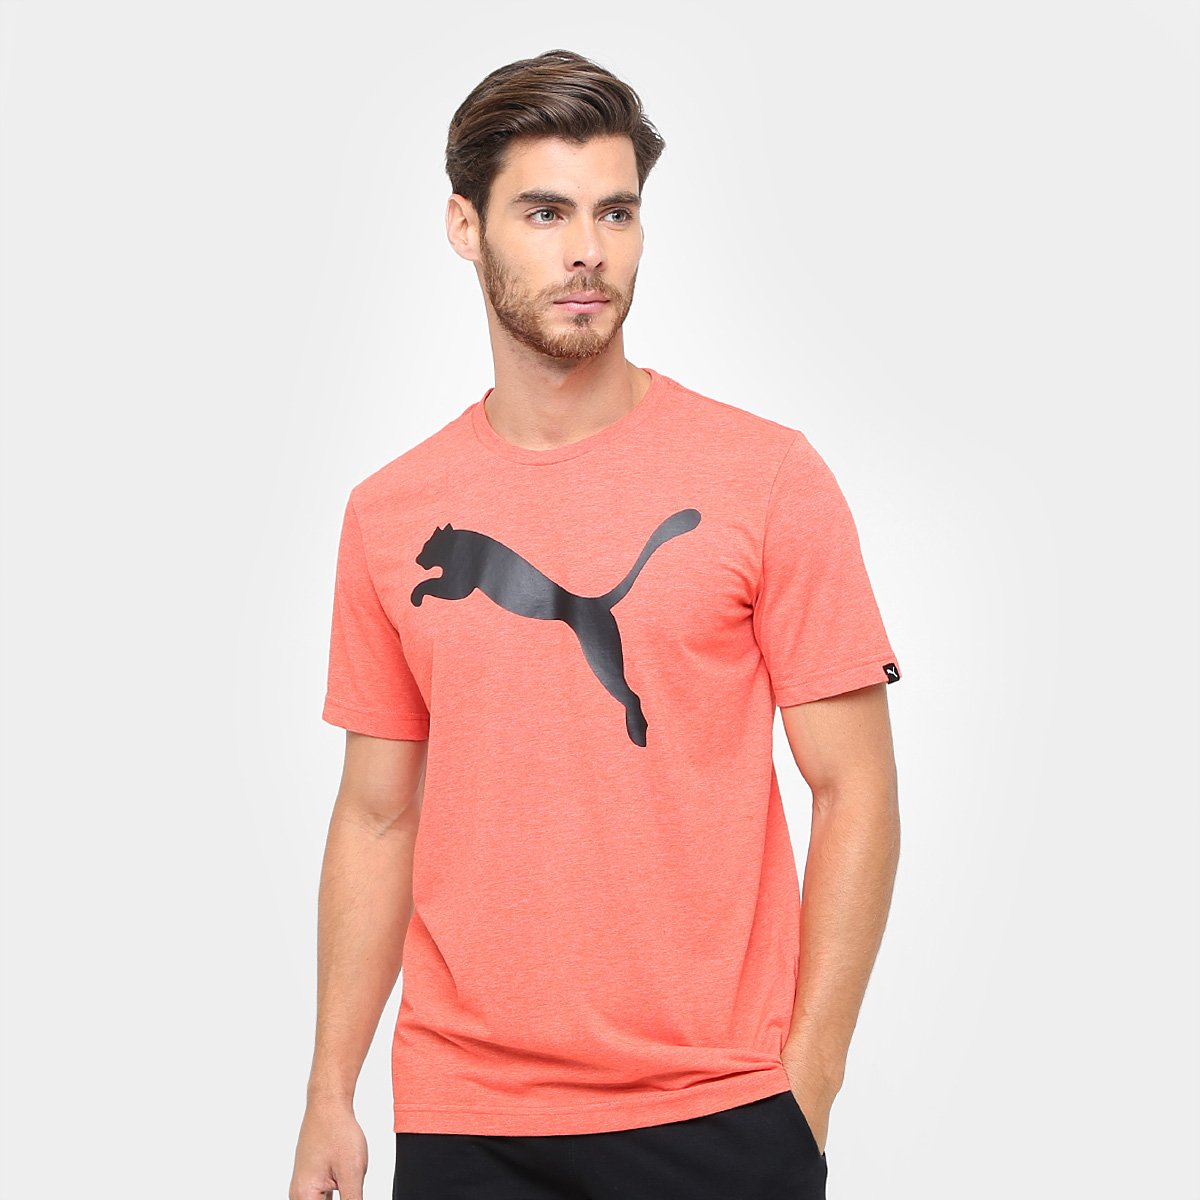 20f31c90d8 Camiseta Puma Ess Big Cat Heather Tee Masculina - Compre Agora ...